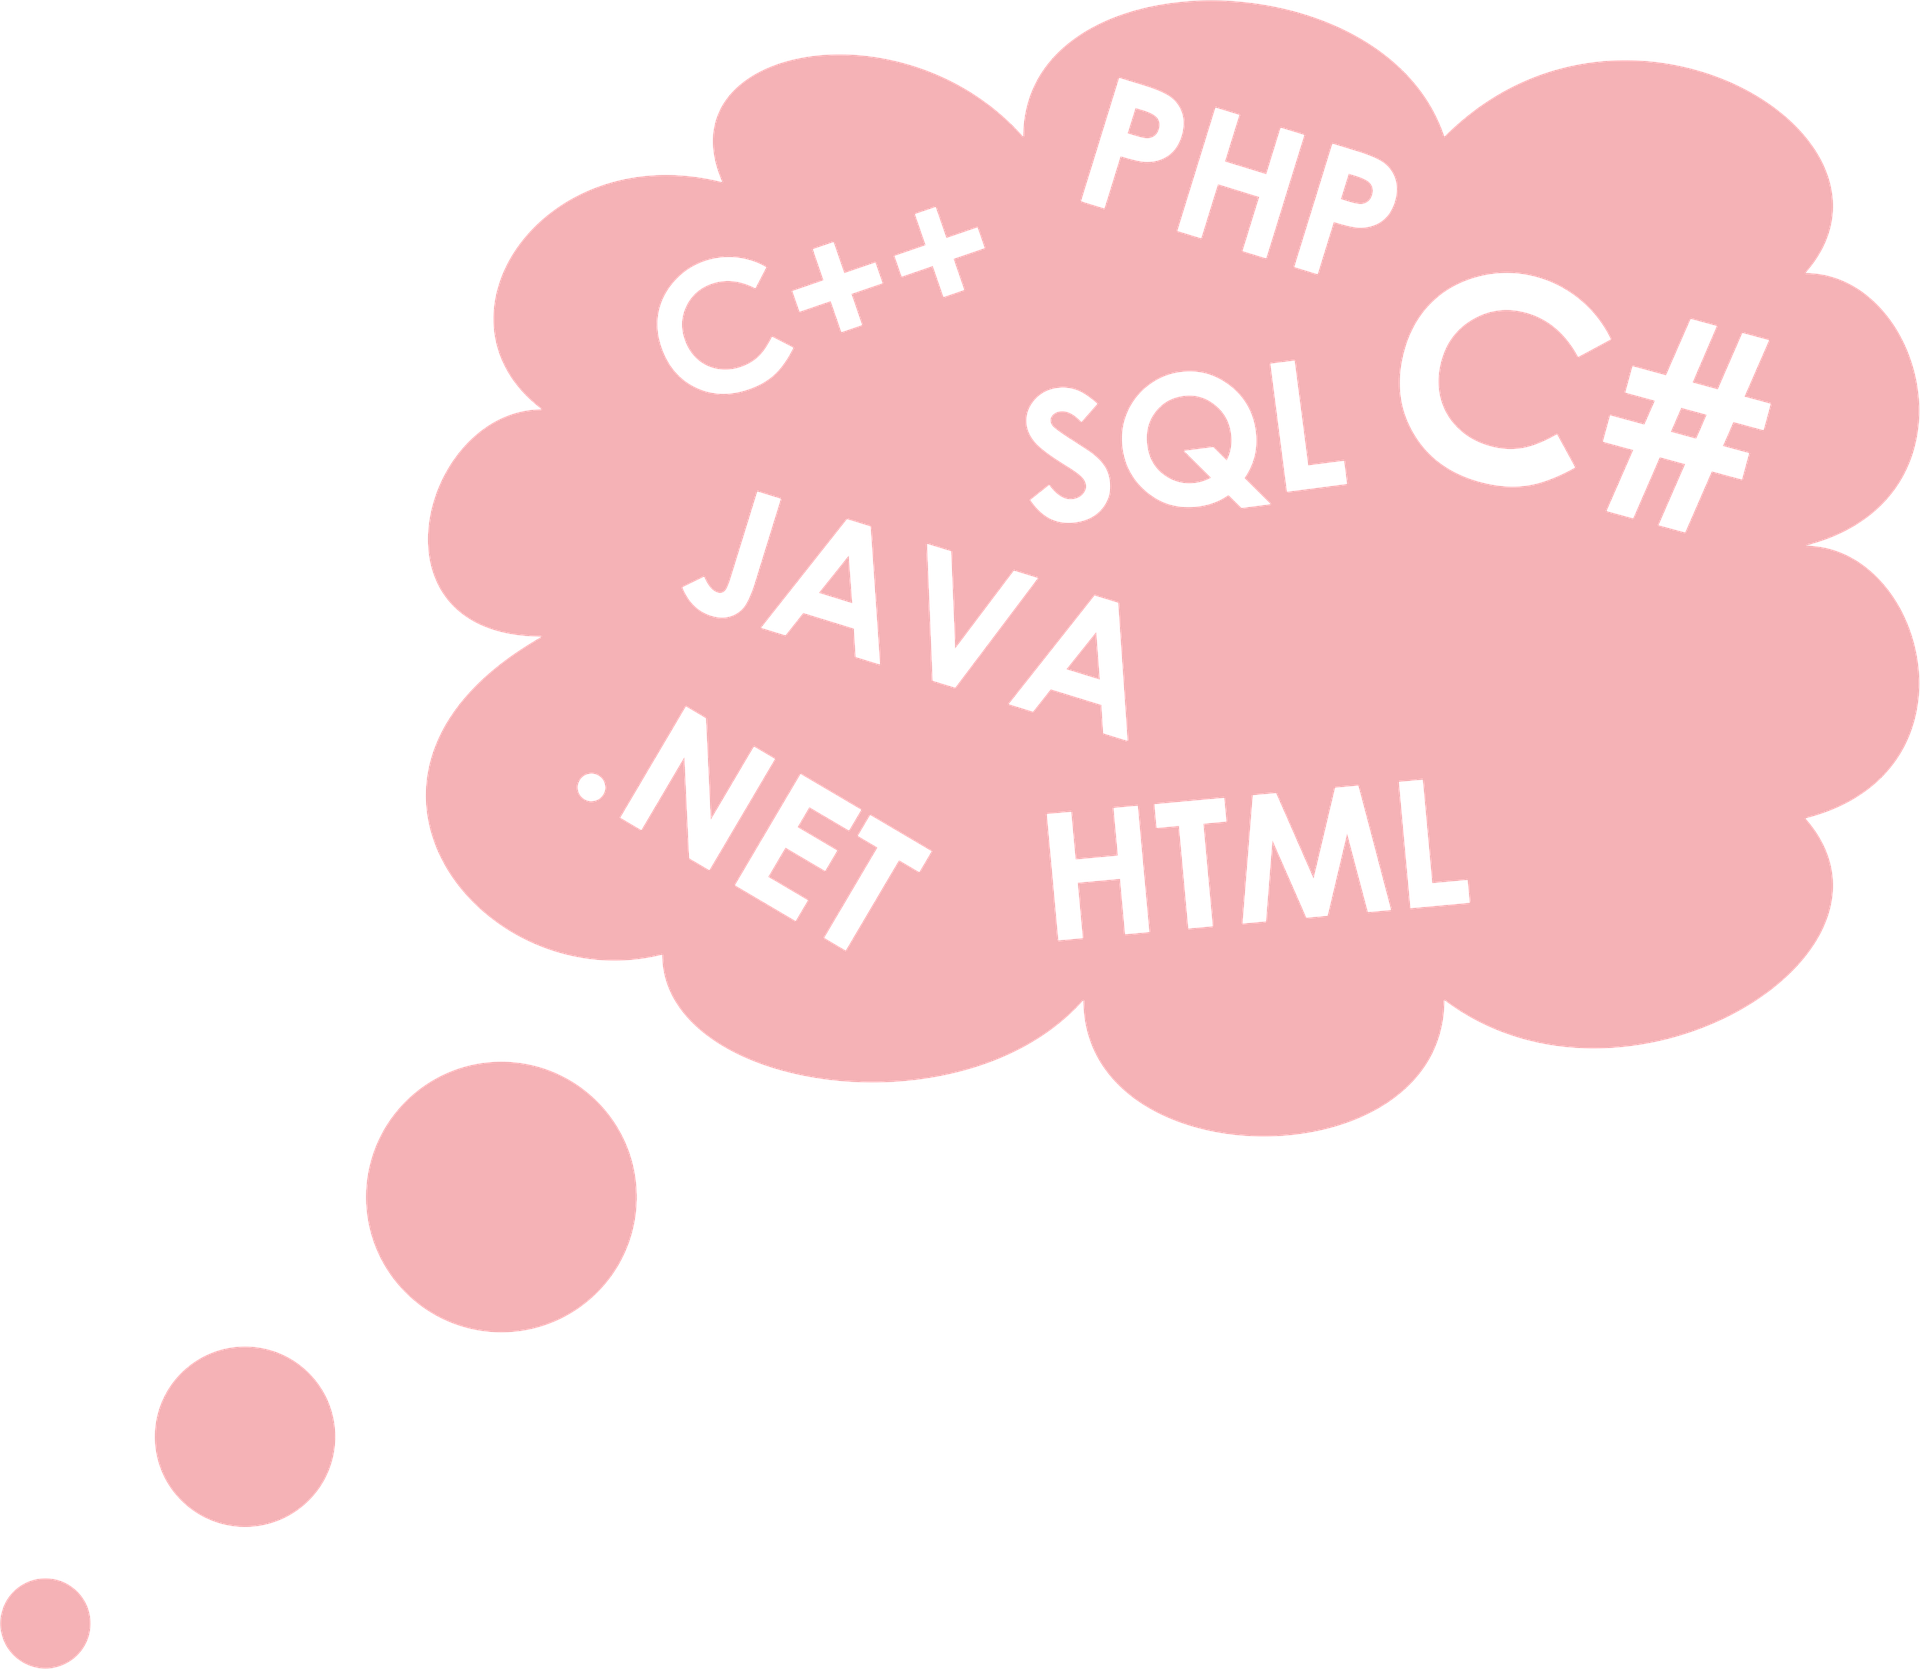 WordPressのPHP編集方法!初心者向けにカスタマイズ方法や学び方を解説